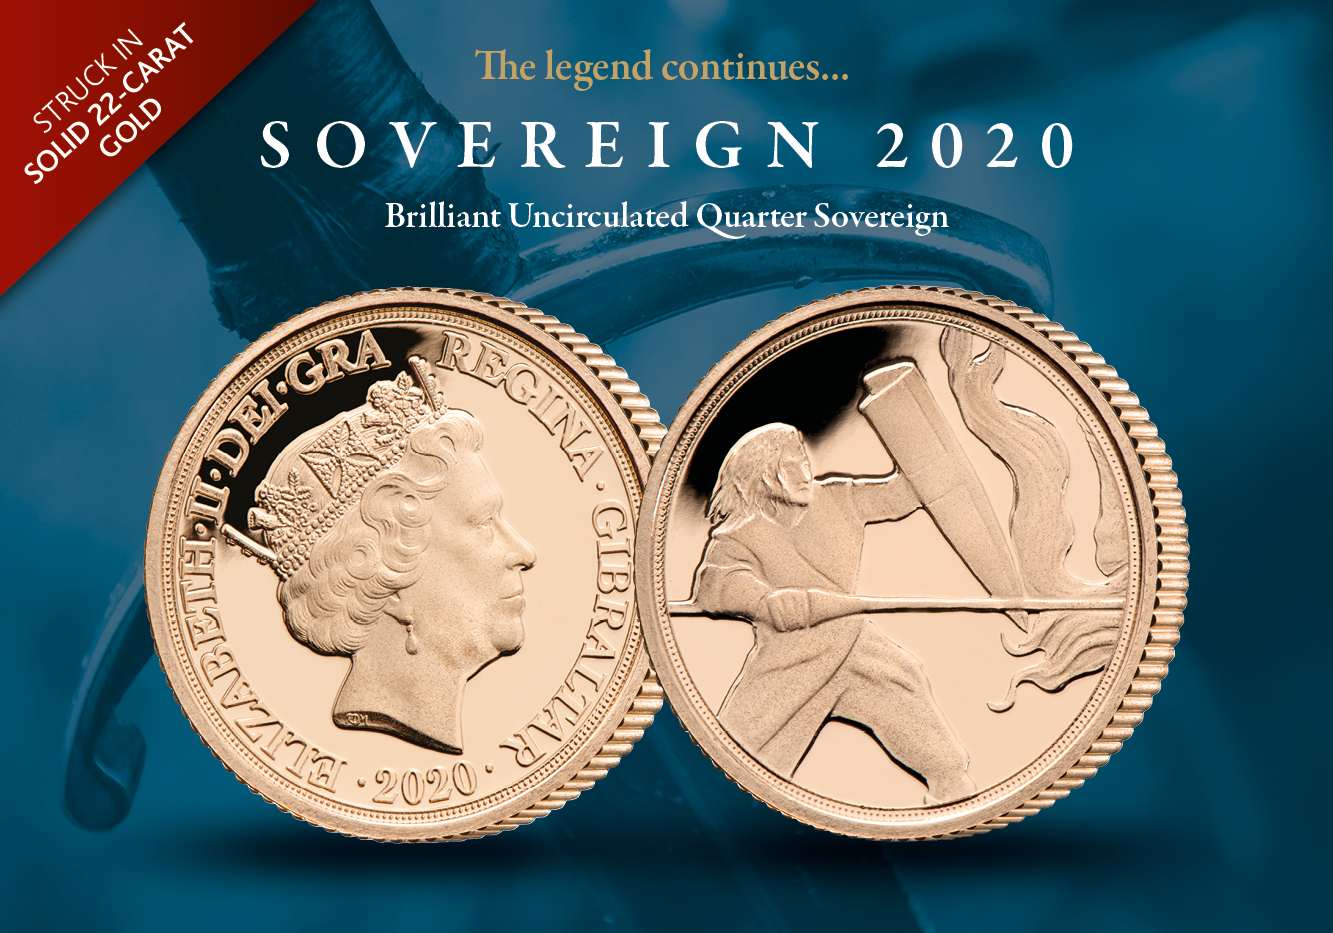 'The Dragon Attacks' 2020 Brilliant Uncirculated Gold Quarter Sovereign